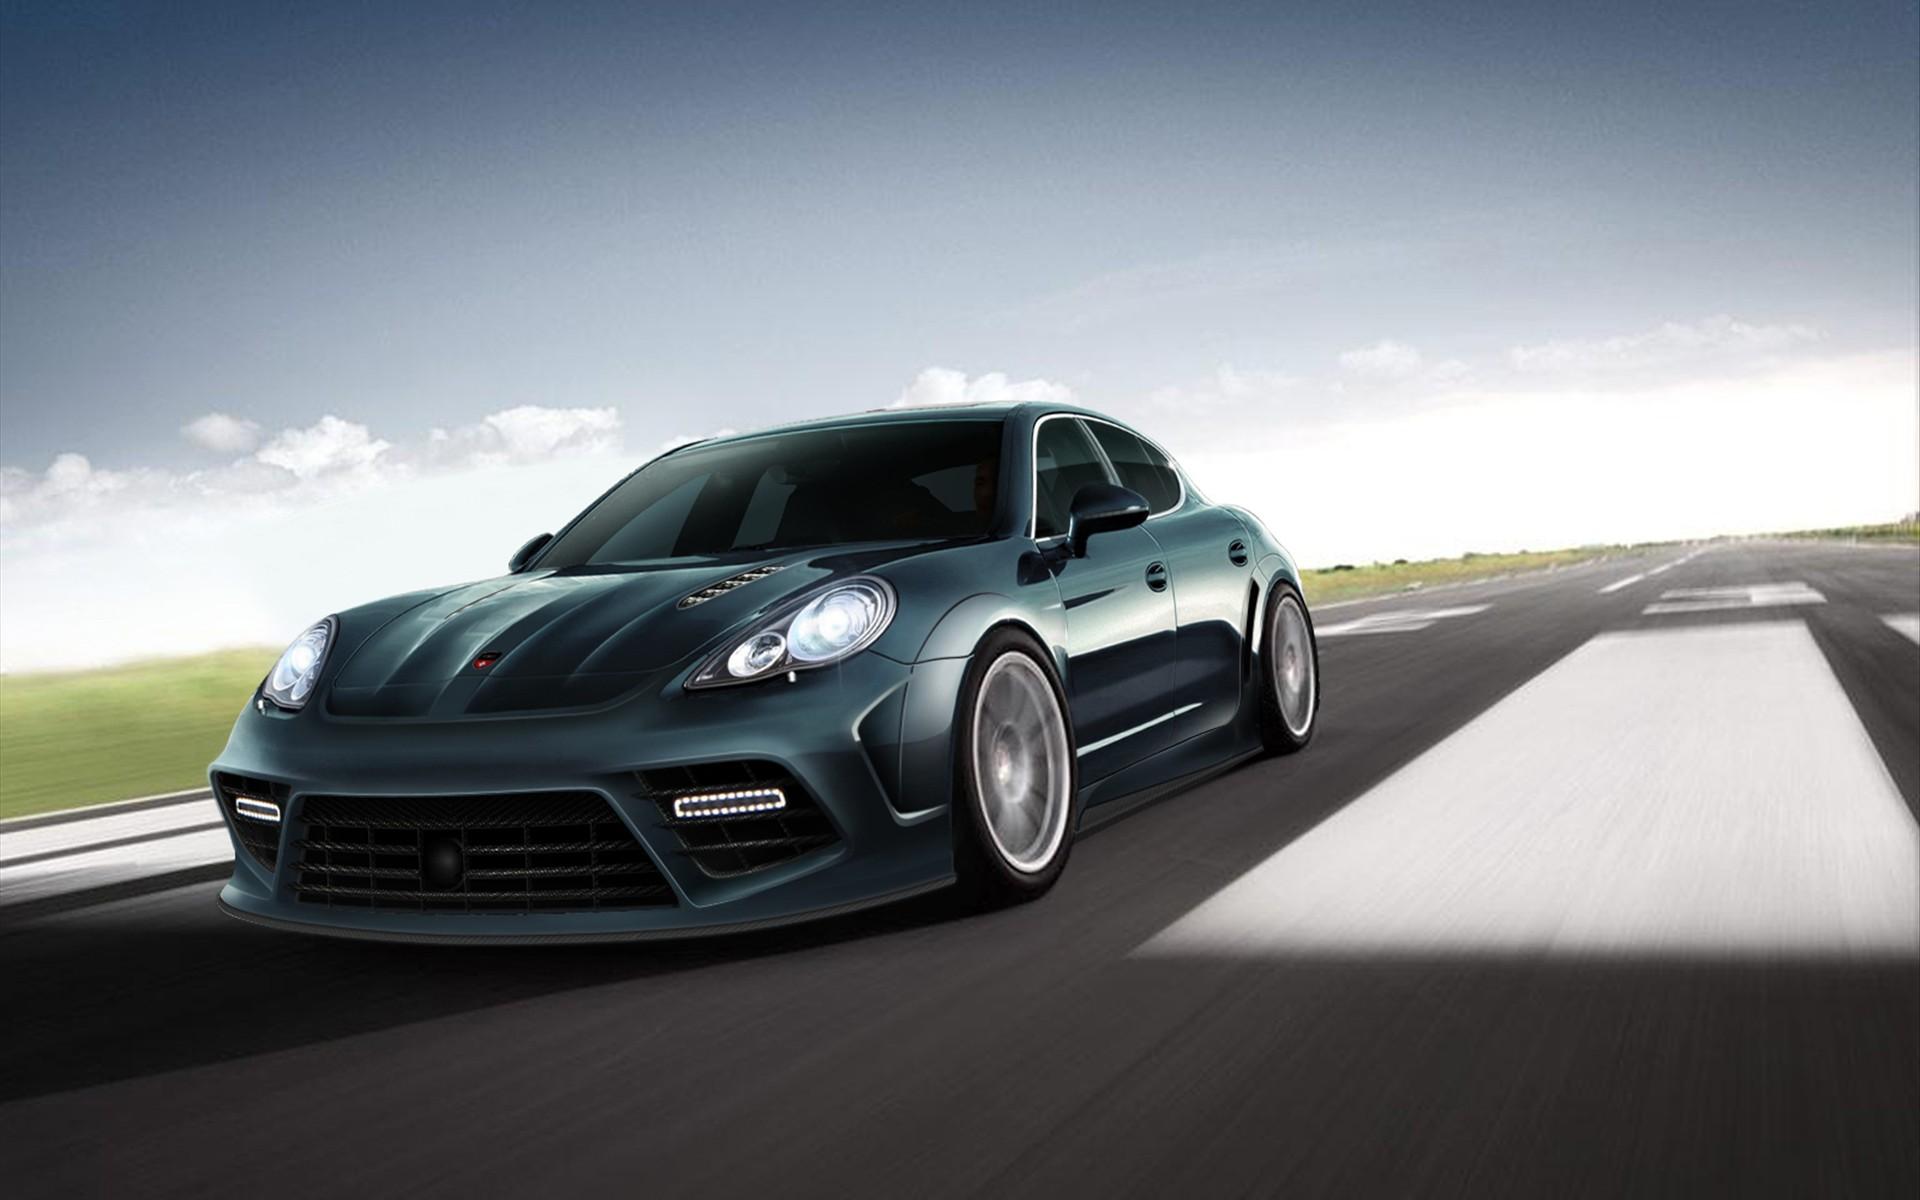 Mansory Porsche Panamera 2 Wallpaper  Hd Car Wallpapers